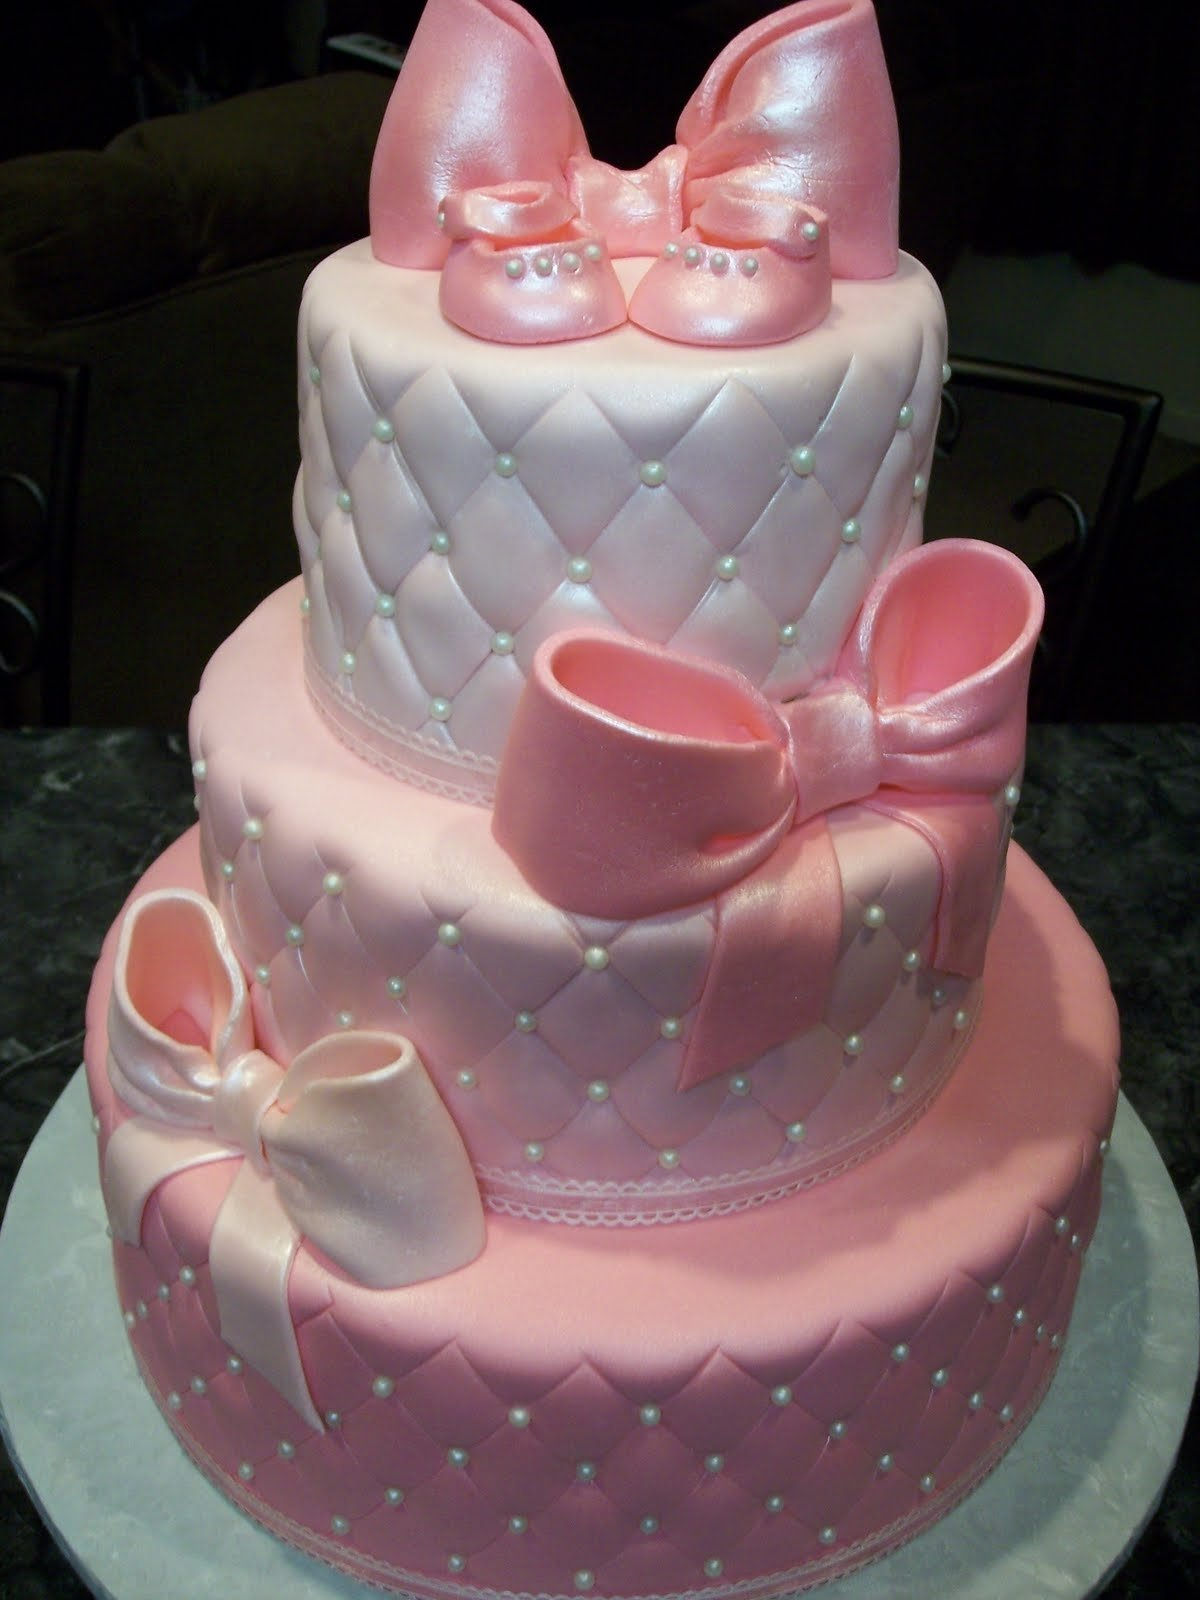 10 Wonderful Ideas For Baby Shower Cakes girl baby shower cakes and cupcakes ideas baby cake imagesbaby 1